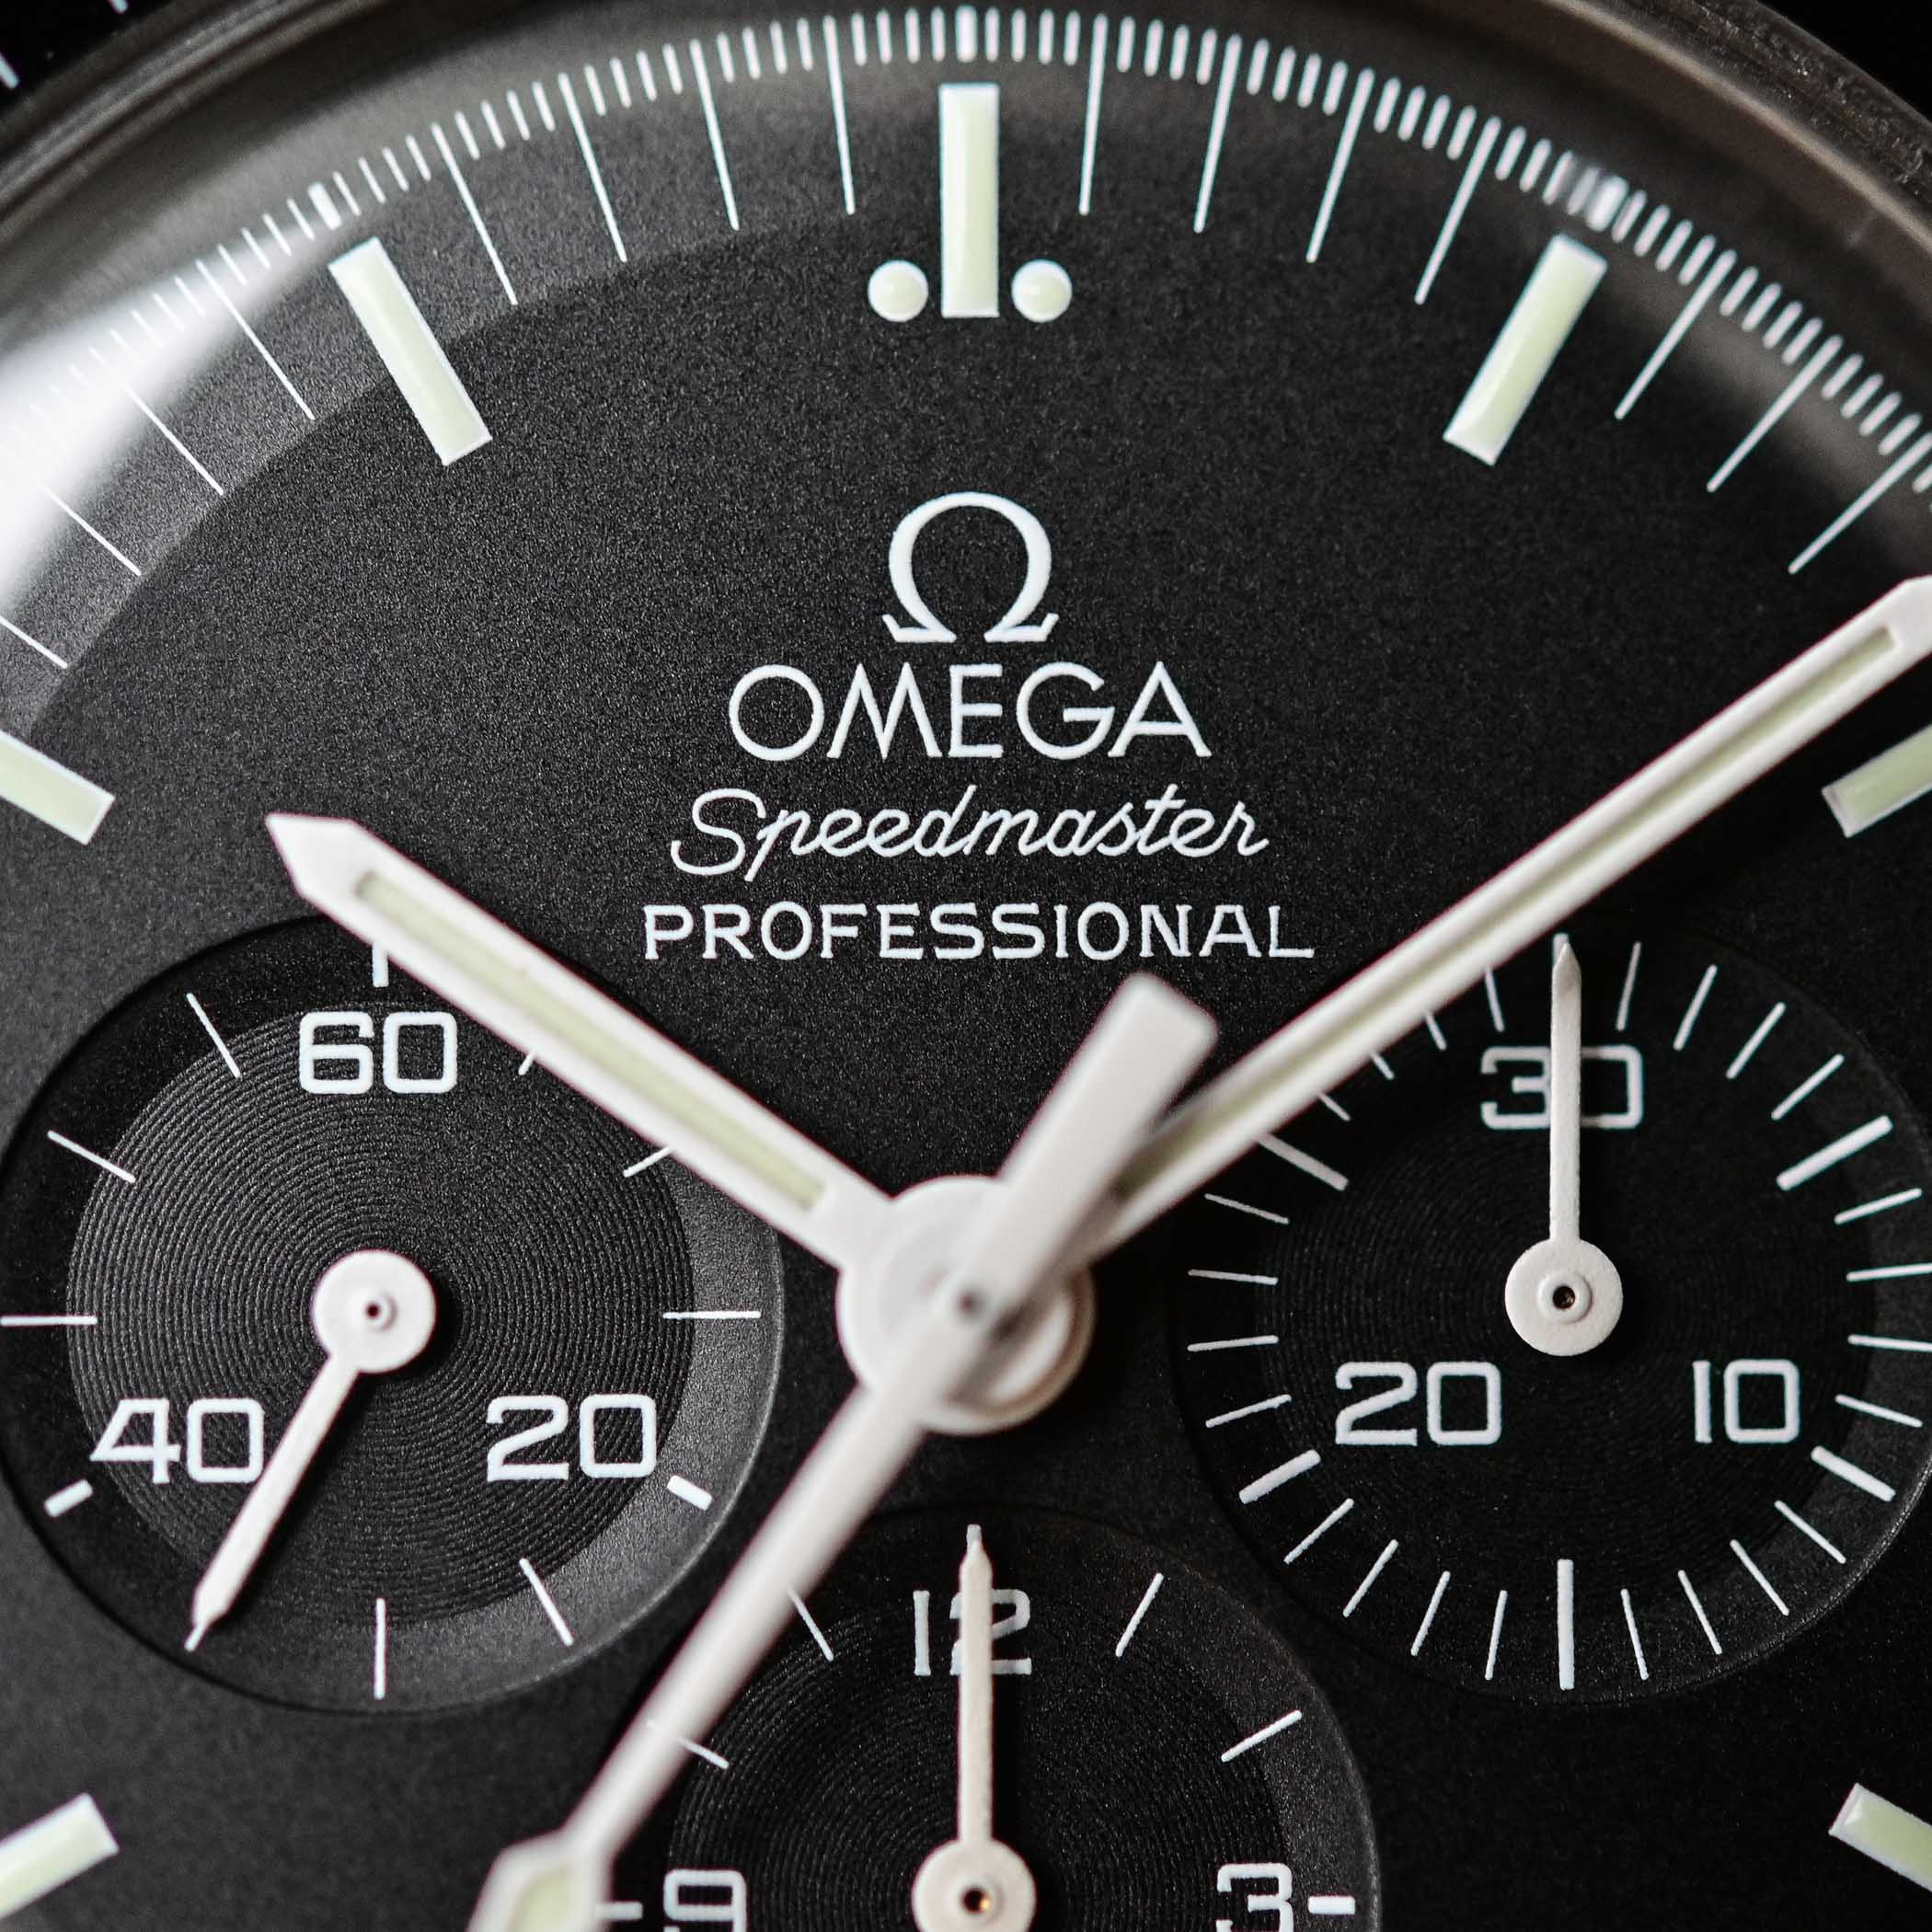 Omega Speedmaster Moonwatch Professional - pre-2021 Calibre 1861 steel on steel hesalite 311.30.42.30.01.005 - 10